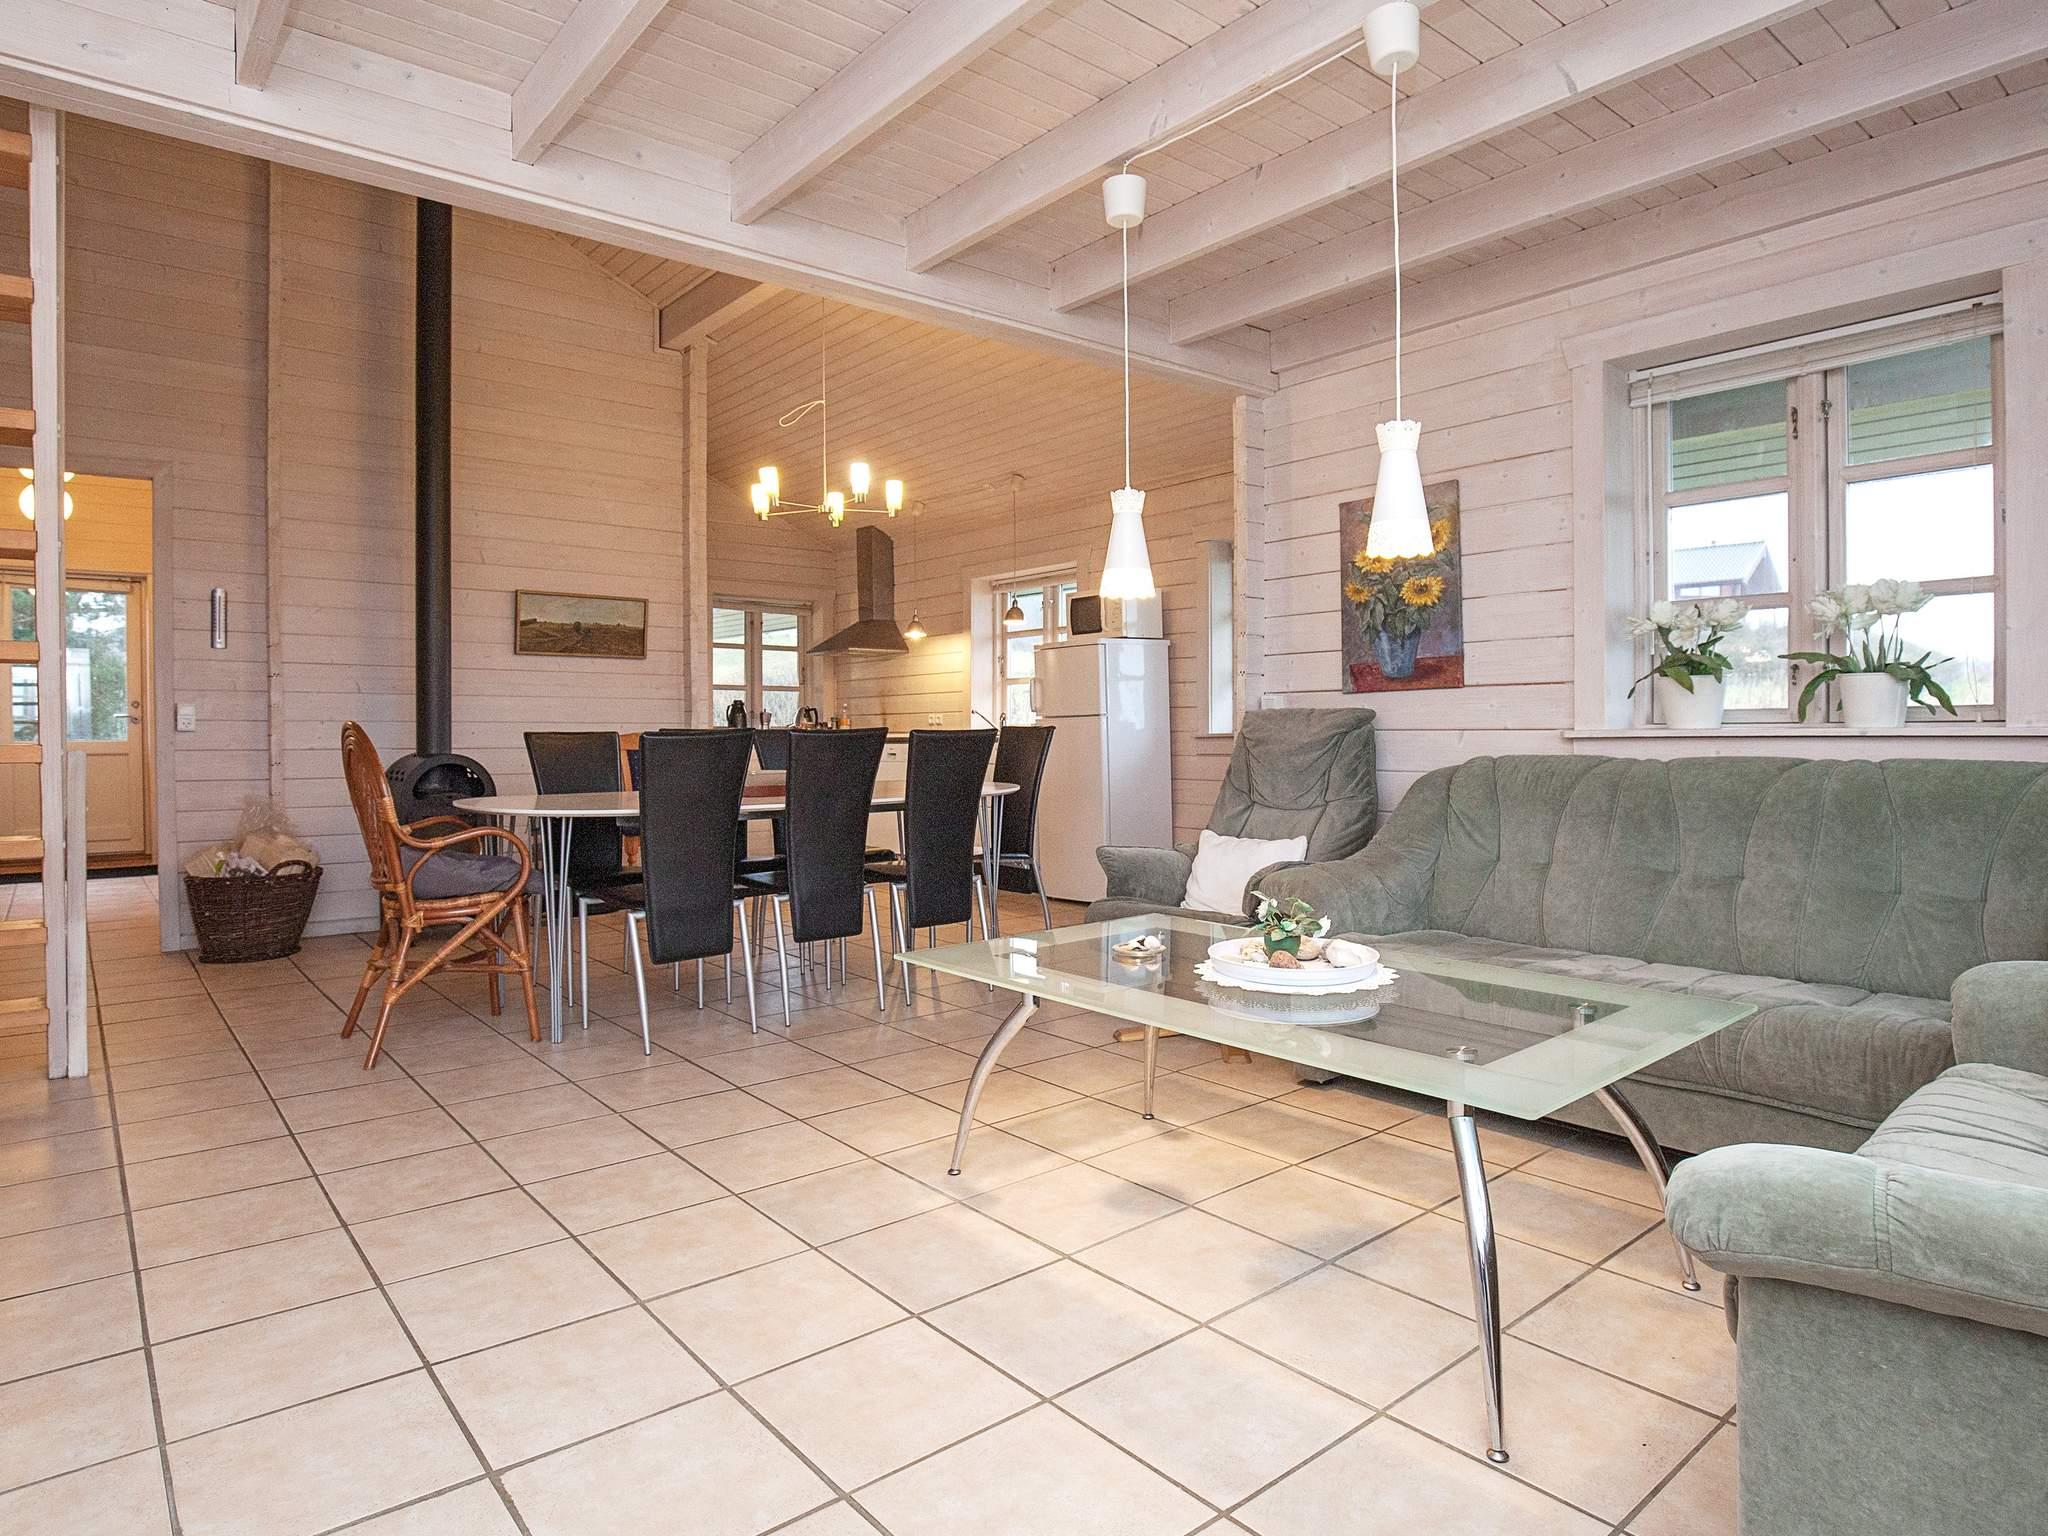 Ferienhaus Røsnæs (264063), Kalundborg, , Westseeland, Dänemark, Bild 10